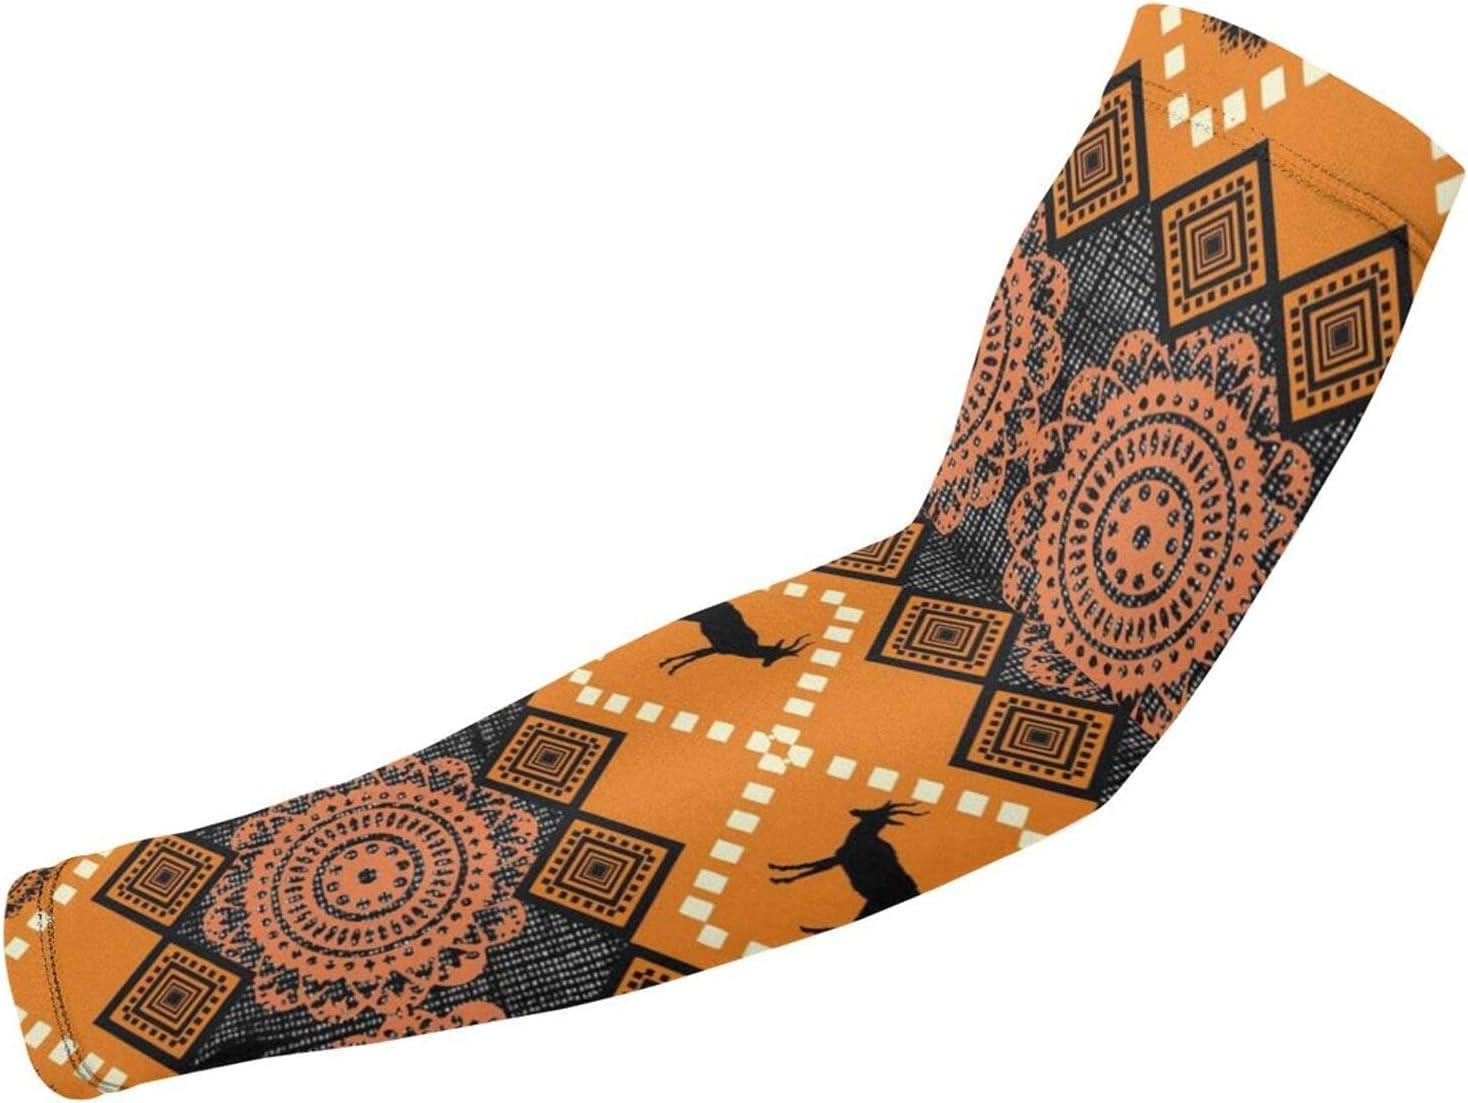 OMOXILOUY Dedication Albuquerque Mall East African Patterns Arm Sunblock Guard Protective Gl